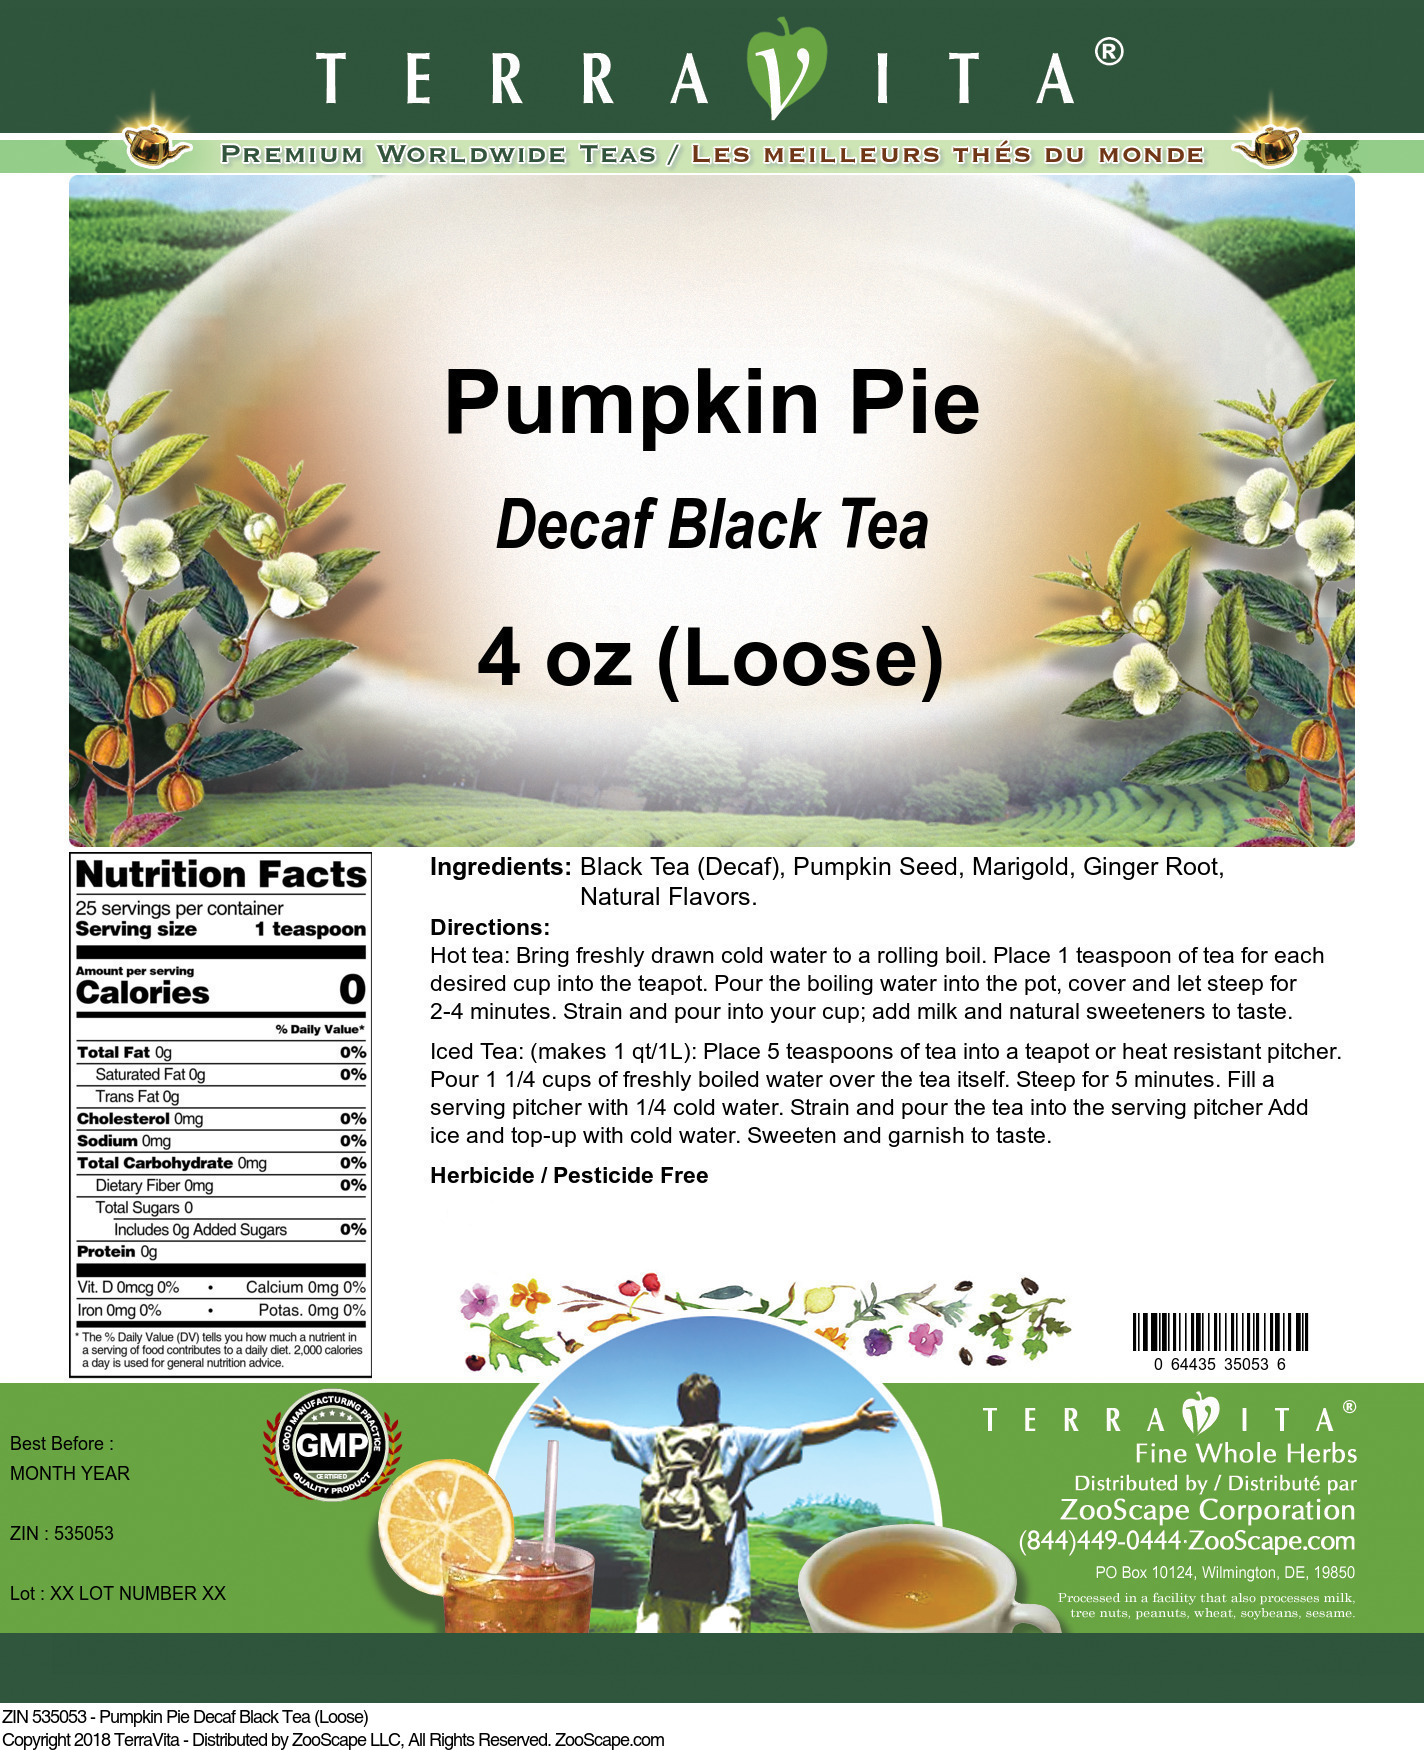 Pumpkin Pie Decaf Black Tea (Loose)